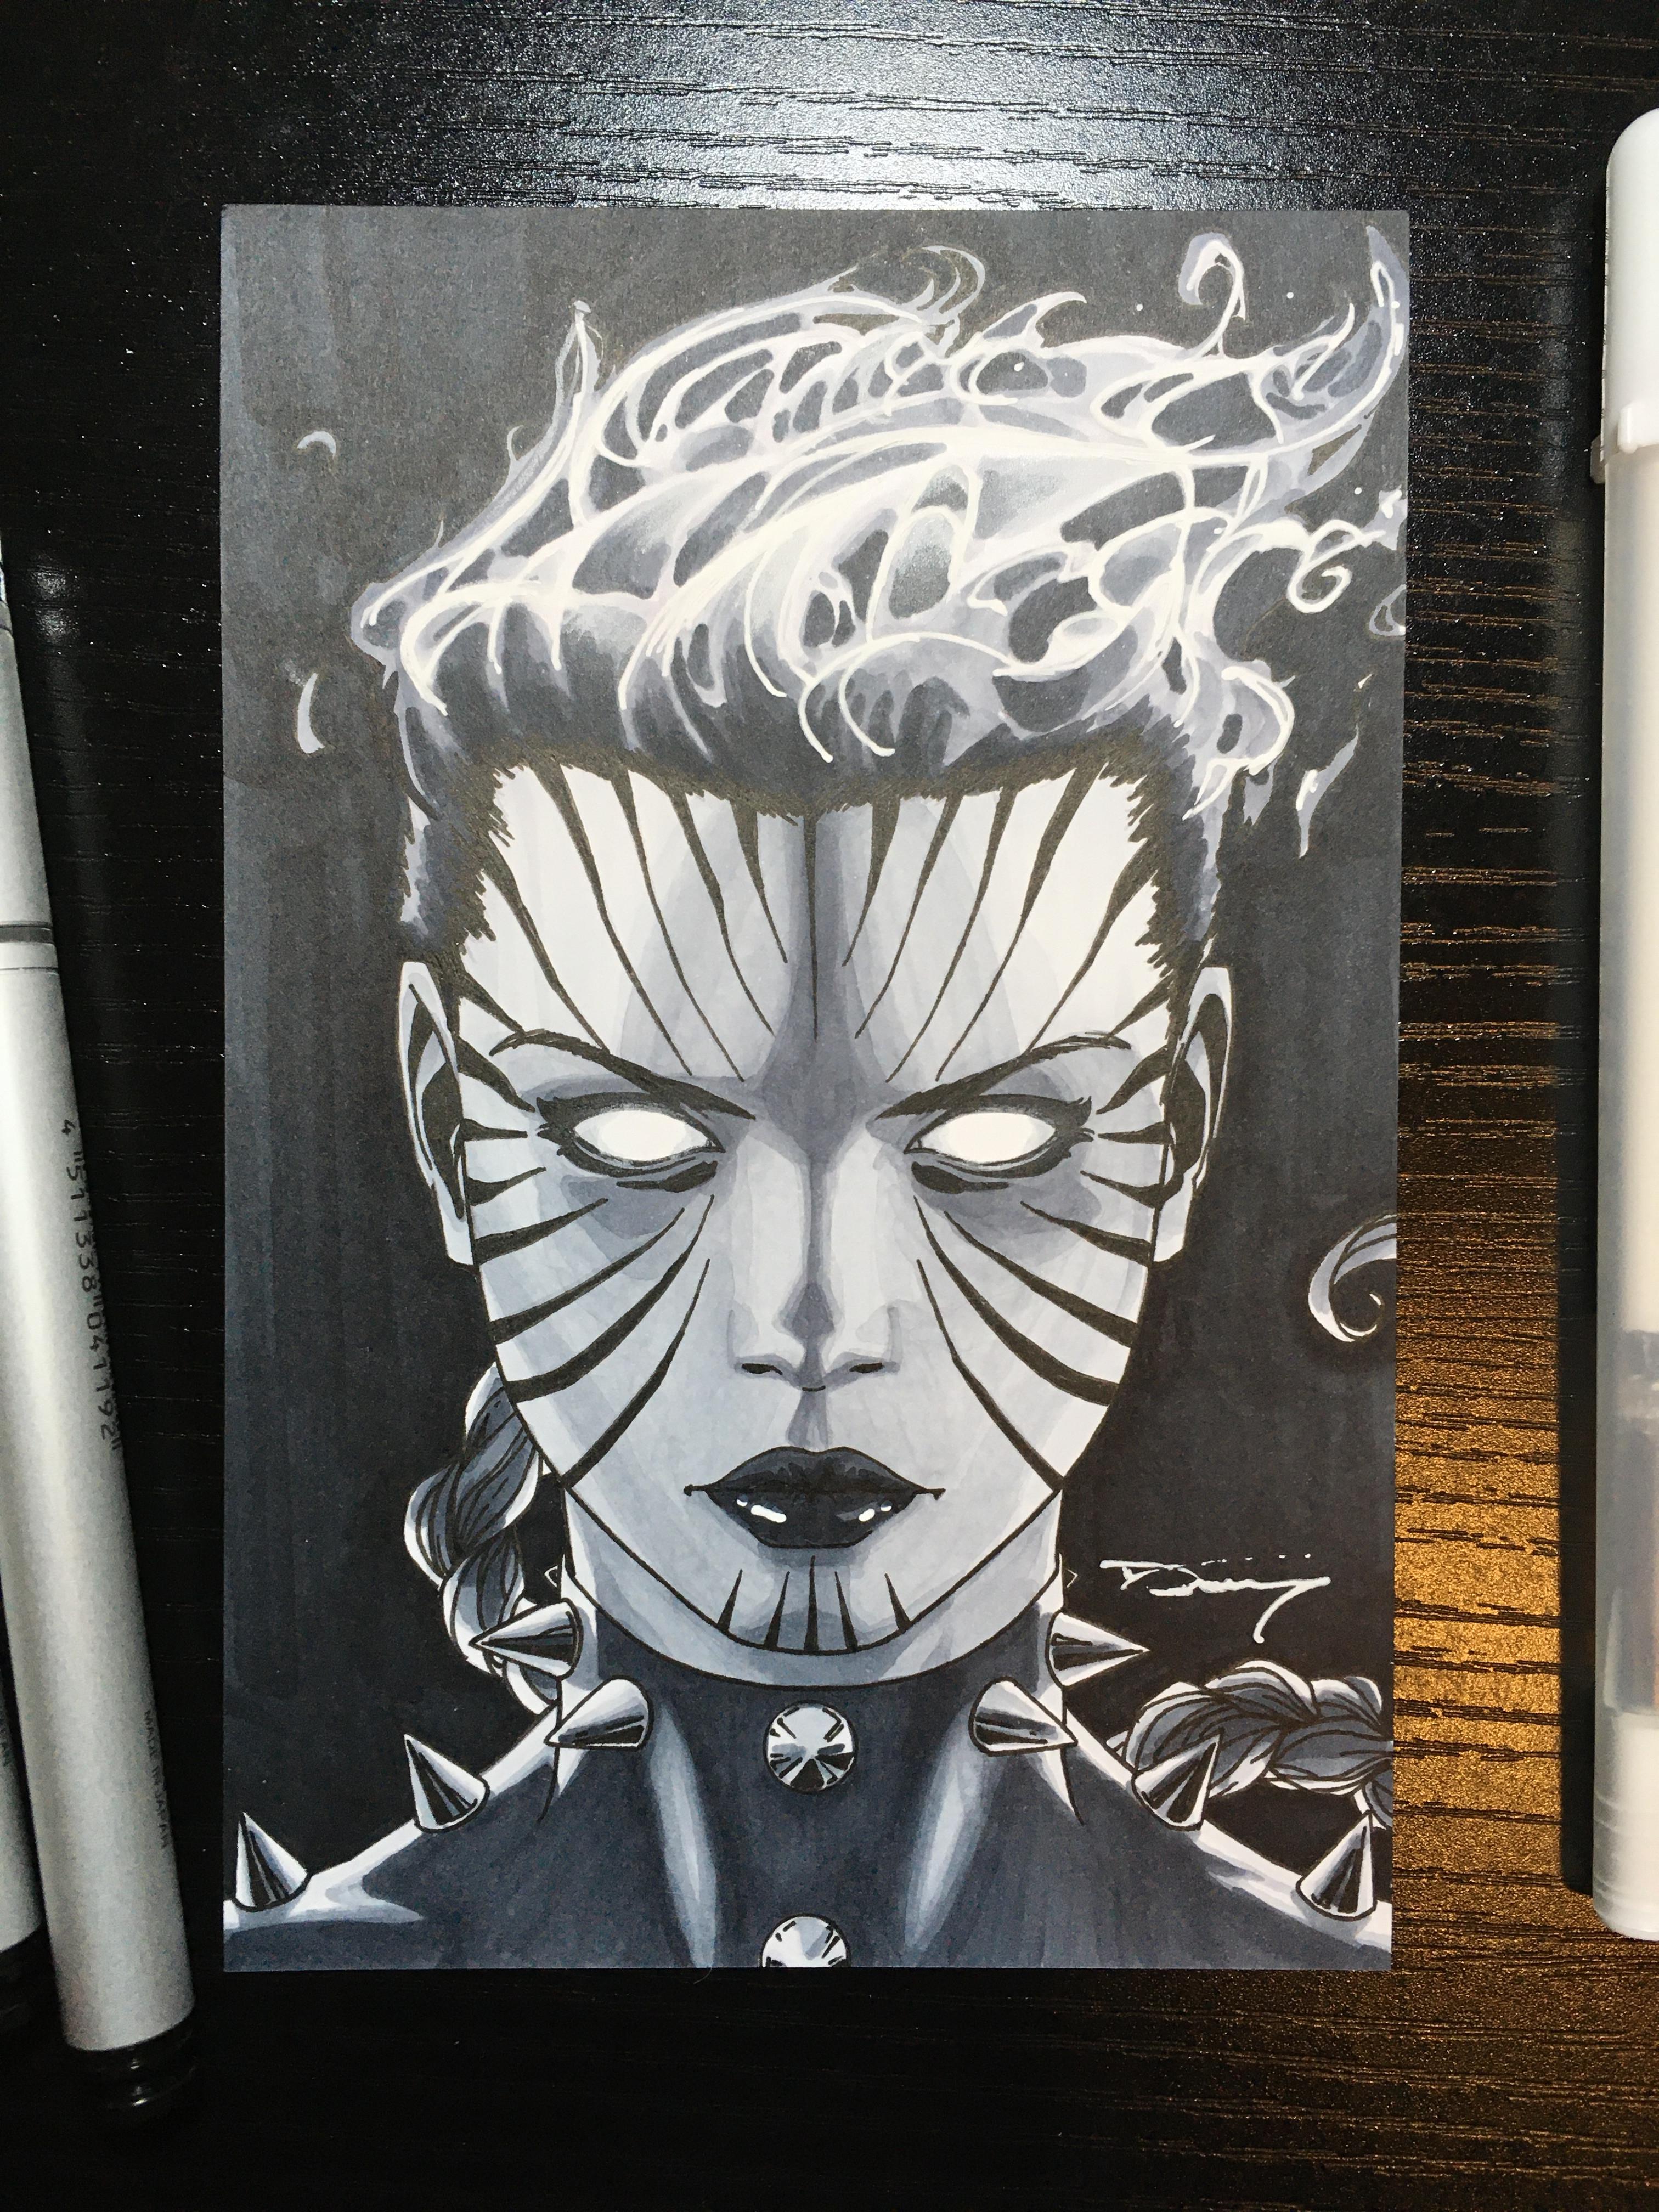 Phoenix/Rachel Summers  Original Sold. Mini Prints still available :)  Follow me on Instagram for the latest updates! https://instagram.com/donnydtran * Art Prints are available over at my online shop: https://donnydtran.bigcartel.com/